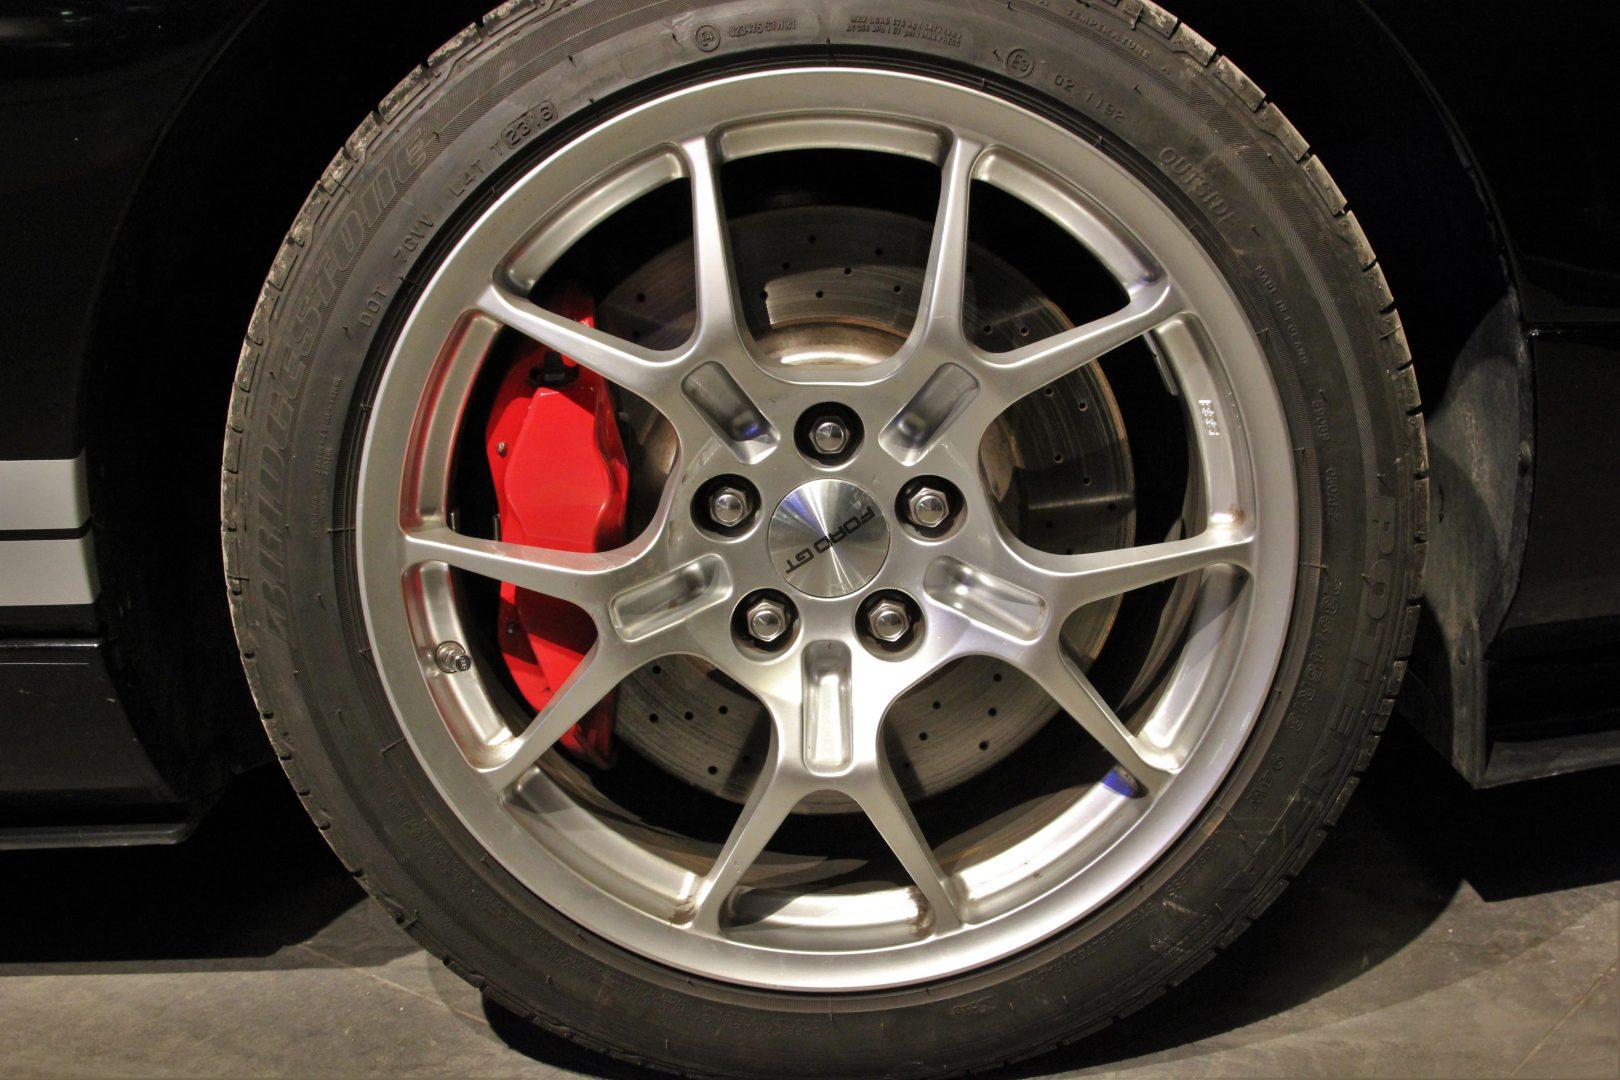 AIL Ford GT 5.4L V8 Supercharger 16